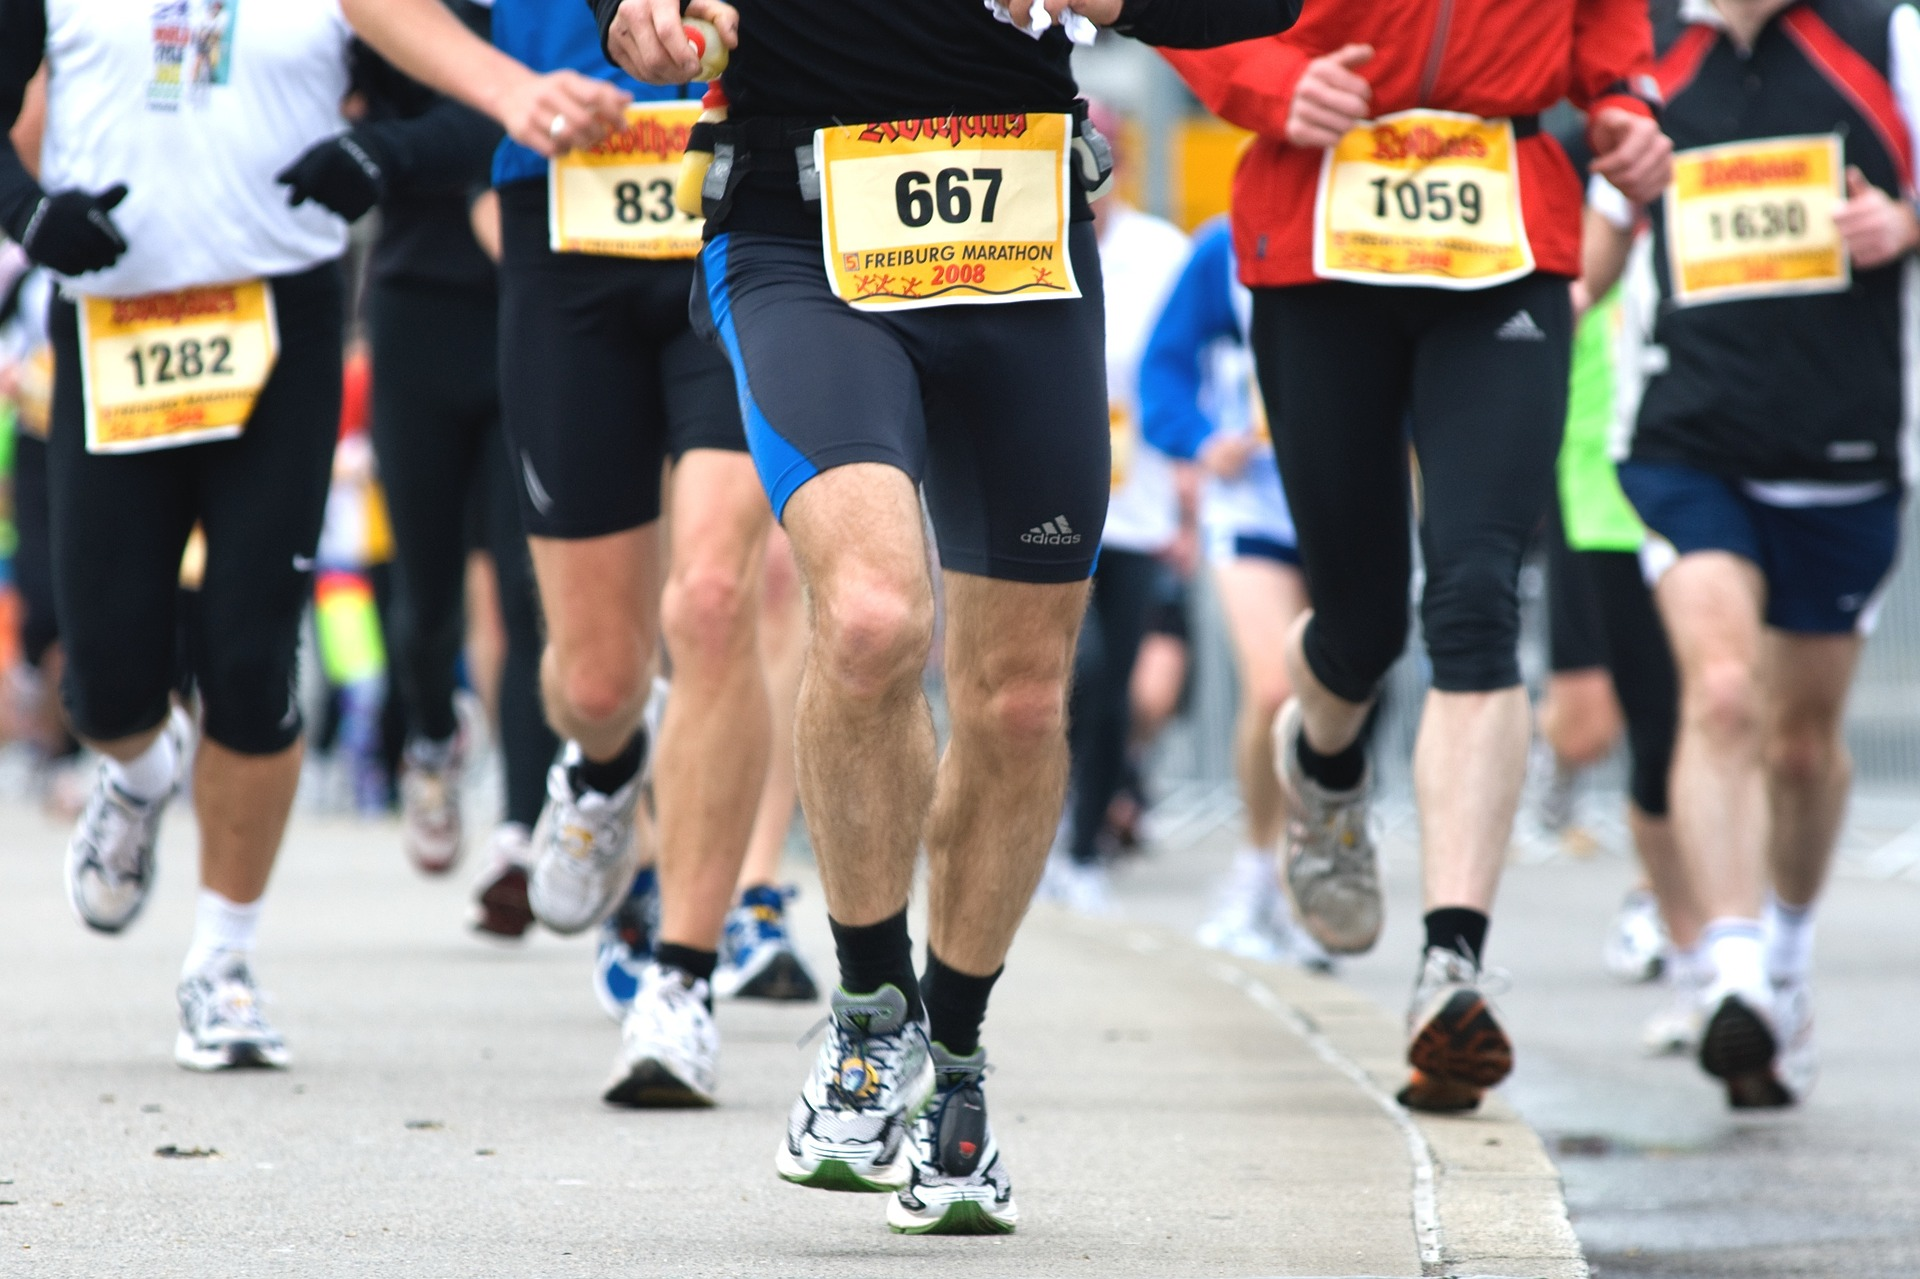 Grøn marathon (Foto: Pixabay)